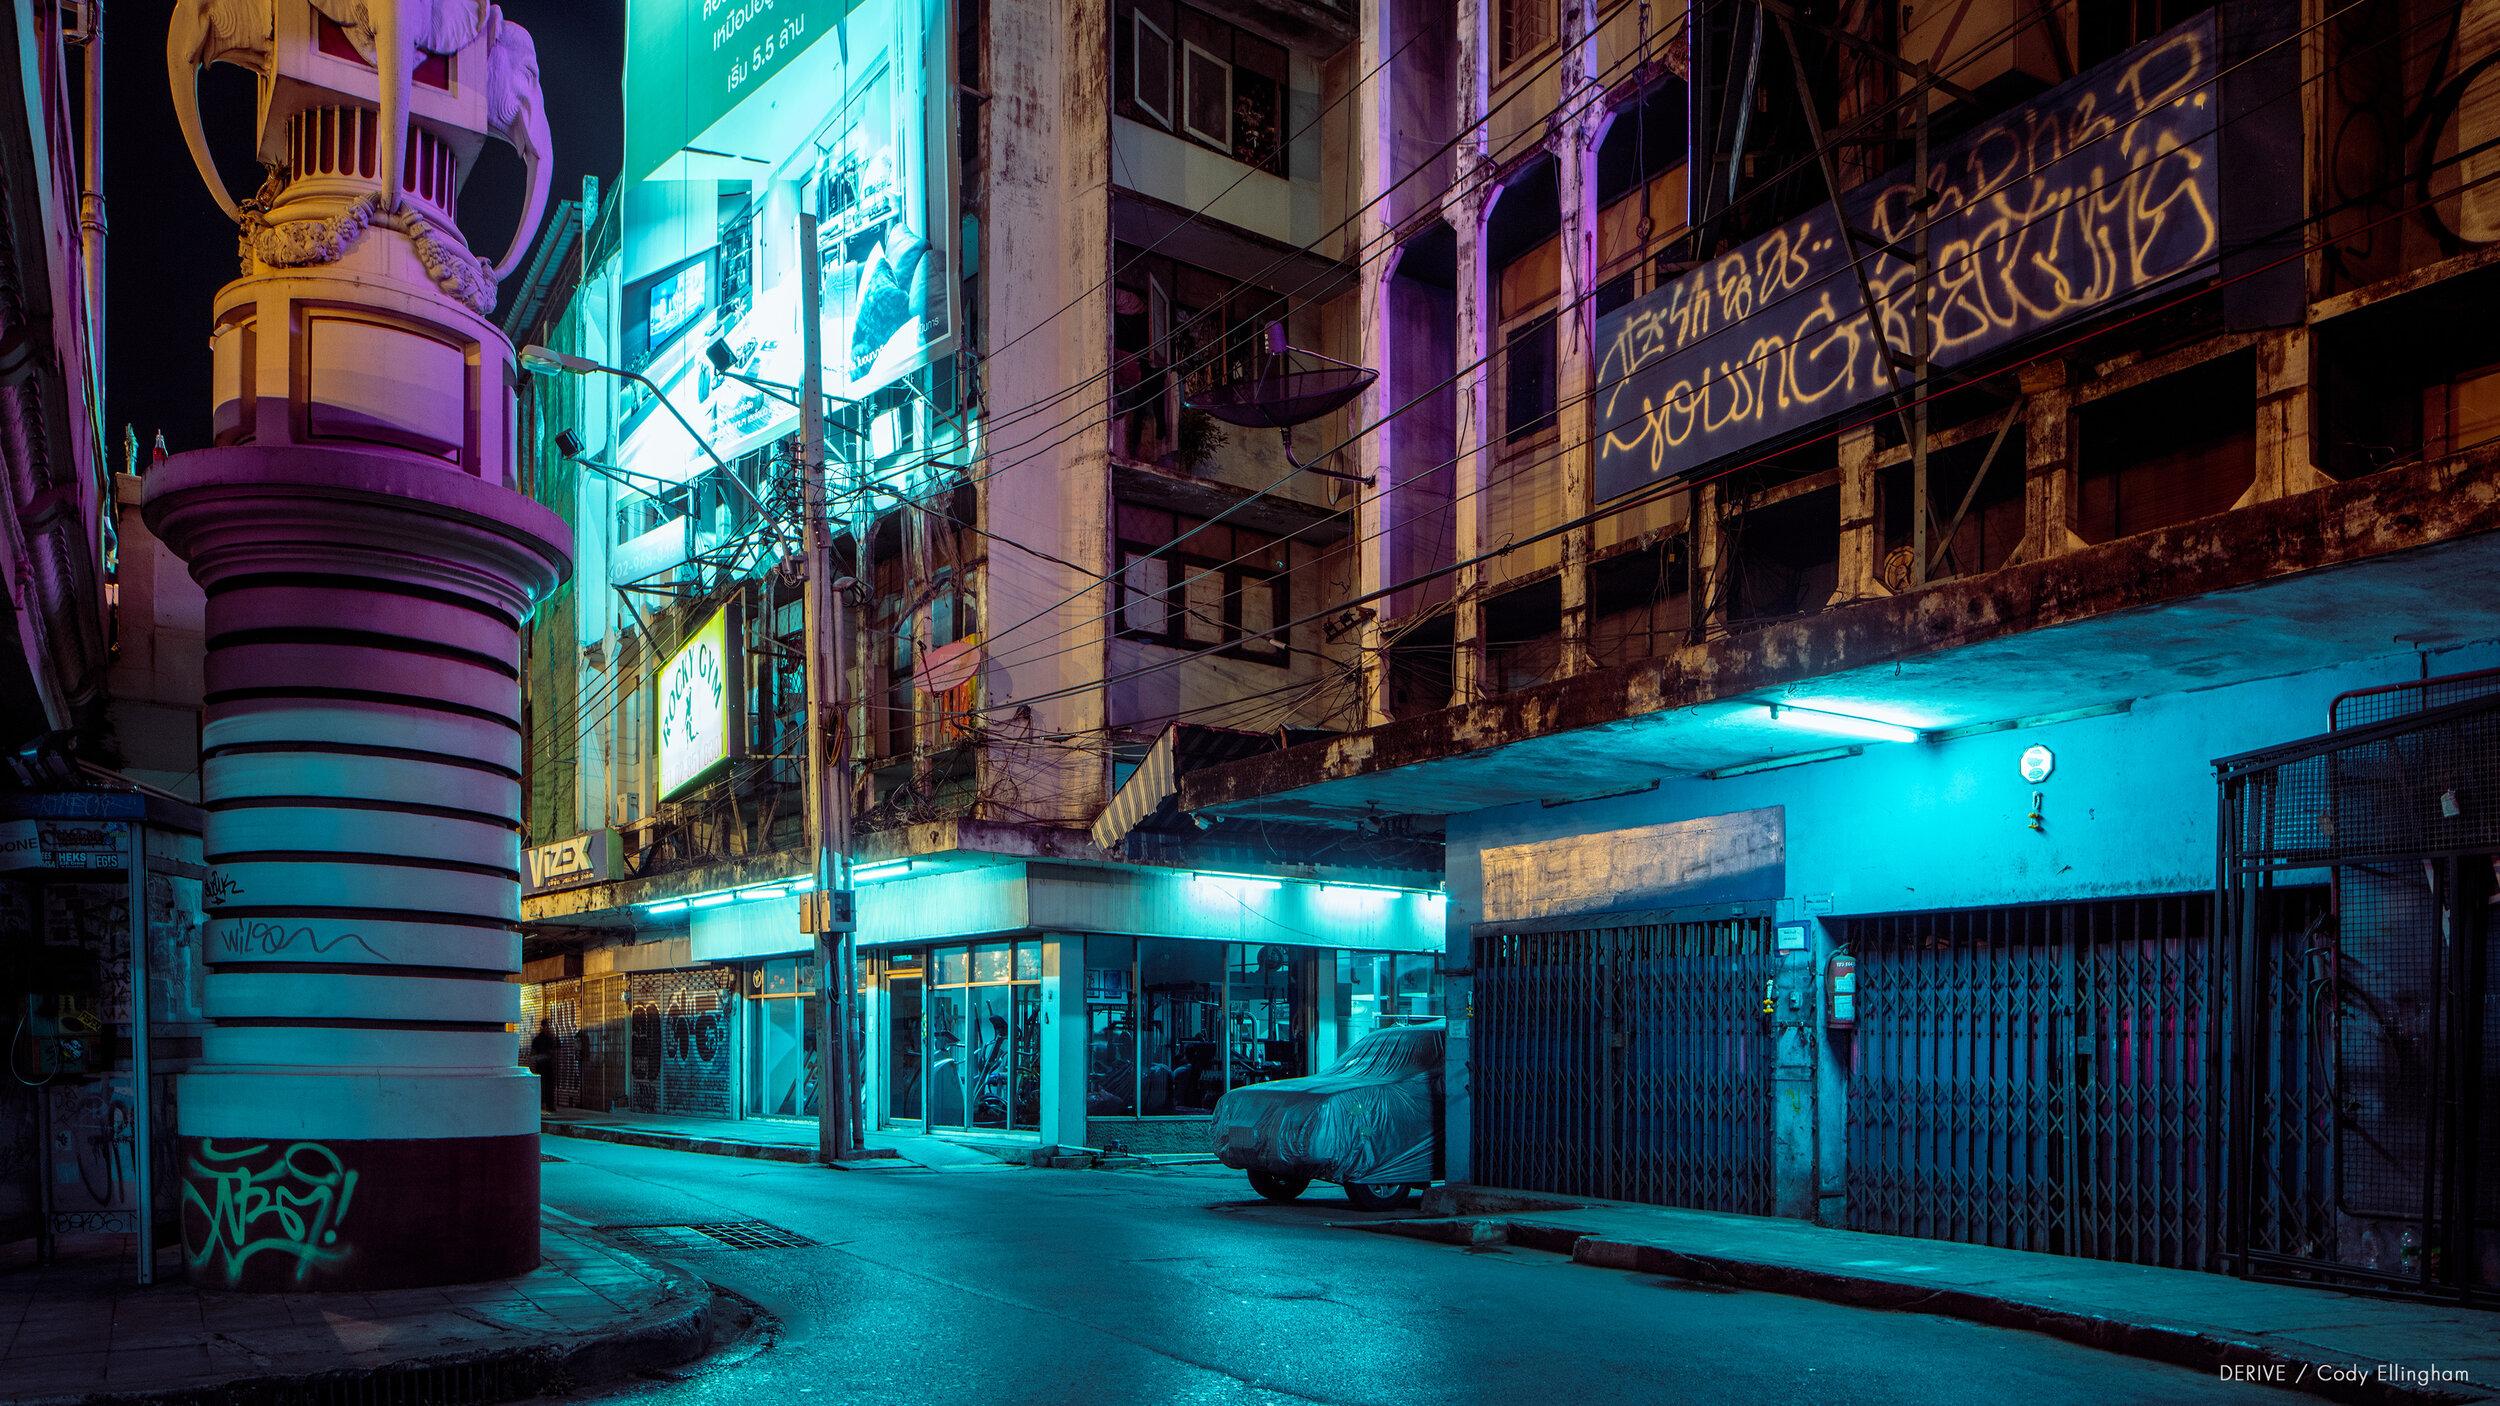 derive-bangkok-phosphors-stillness-cody-ellingham.jpg